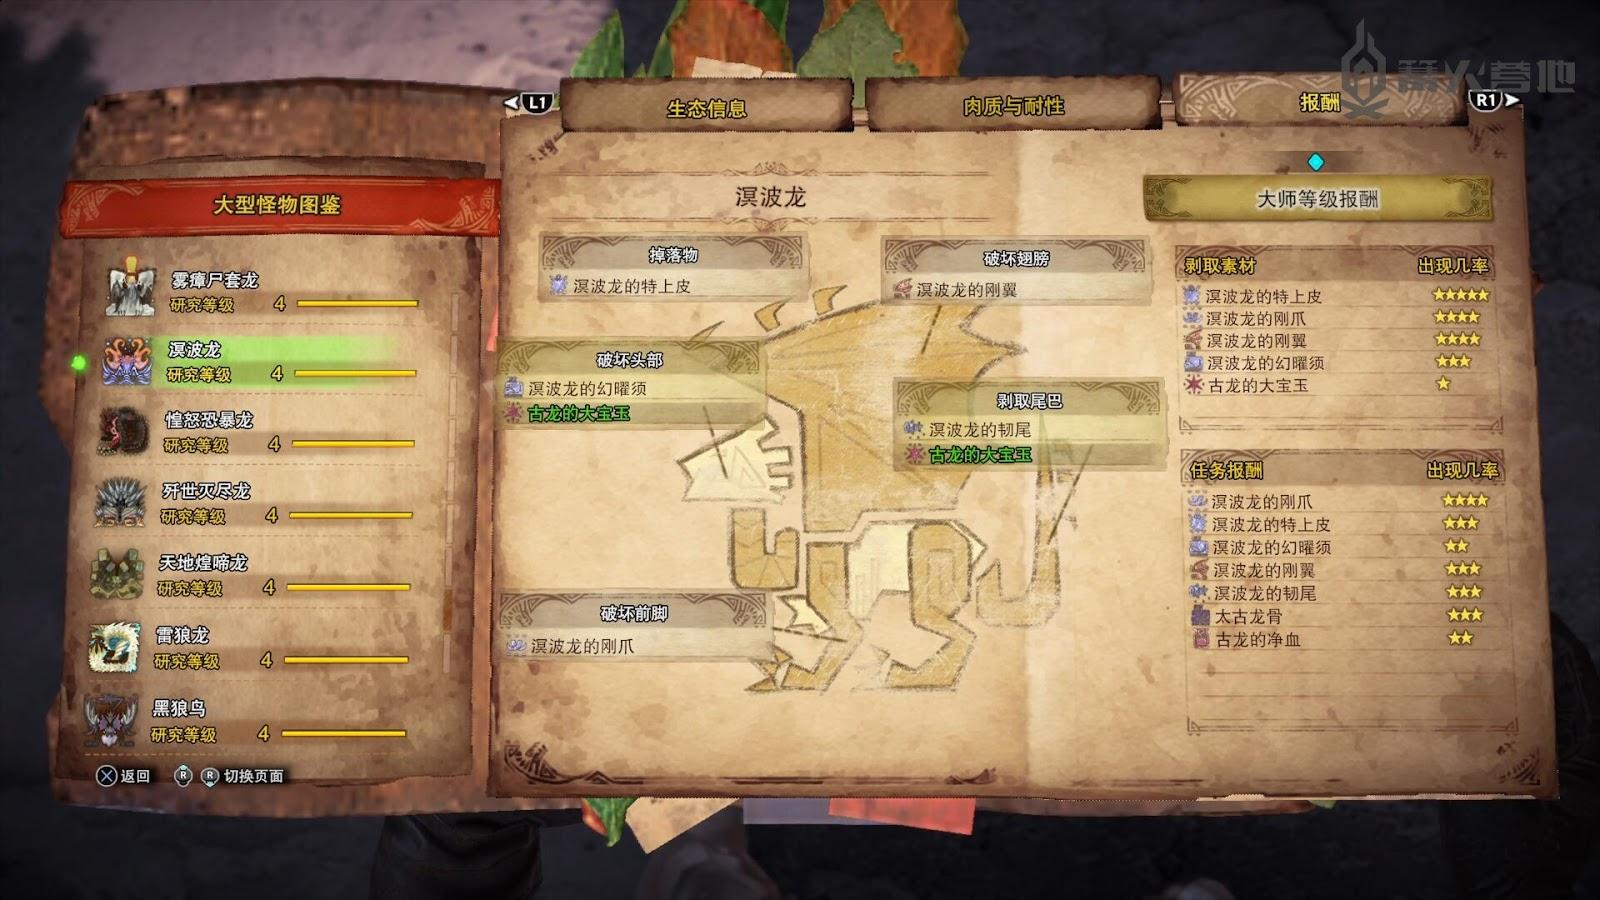 mhw Iceborne 溟波龍屬性弱點攻略 - 魔物獵人 世界 Monster Hunter World 遊戲世界